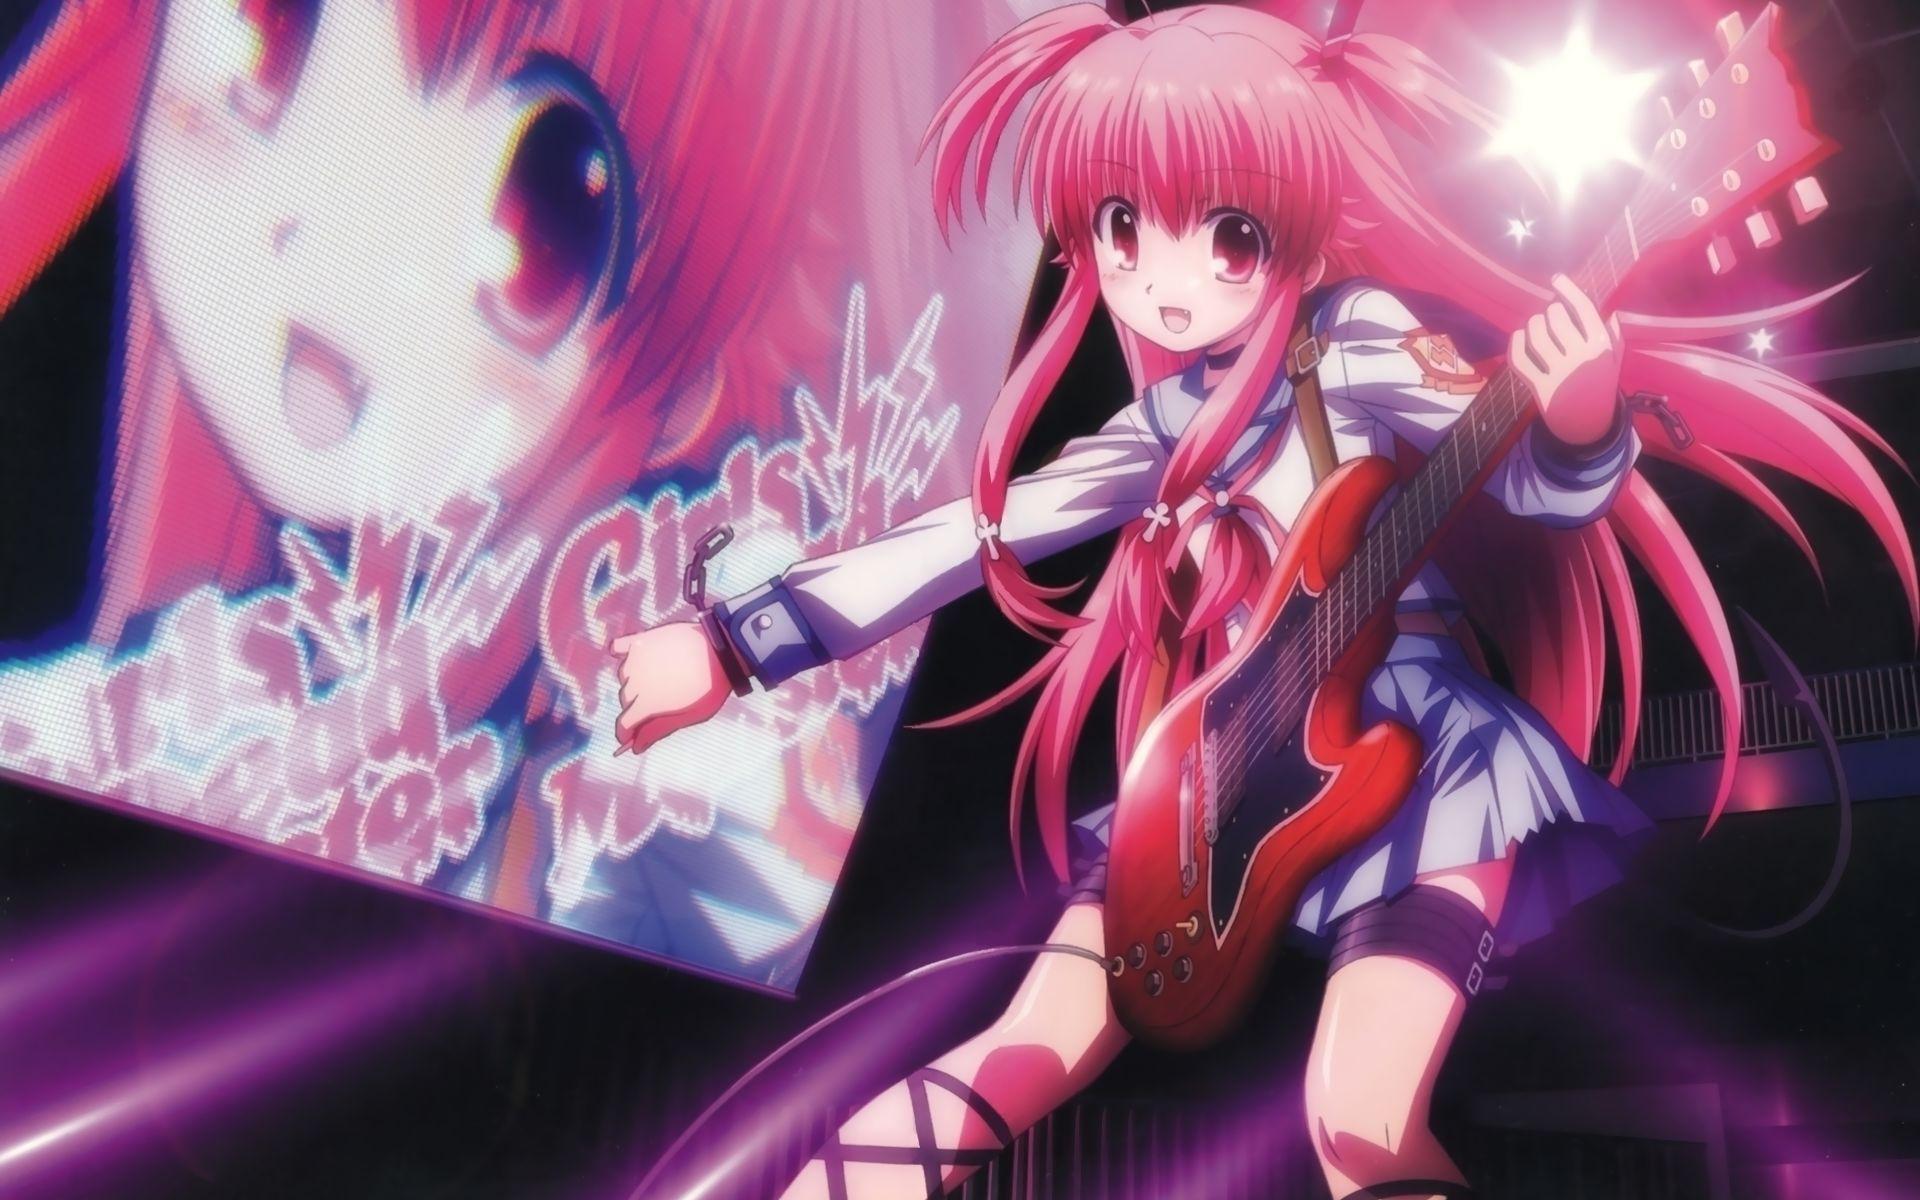 Angel Beats! Wallpaper 9 - Anime Desu